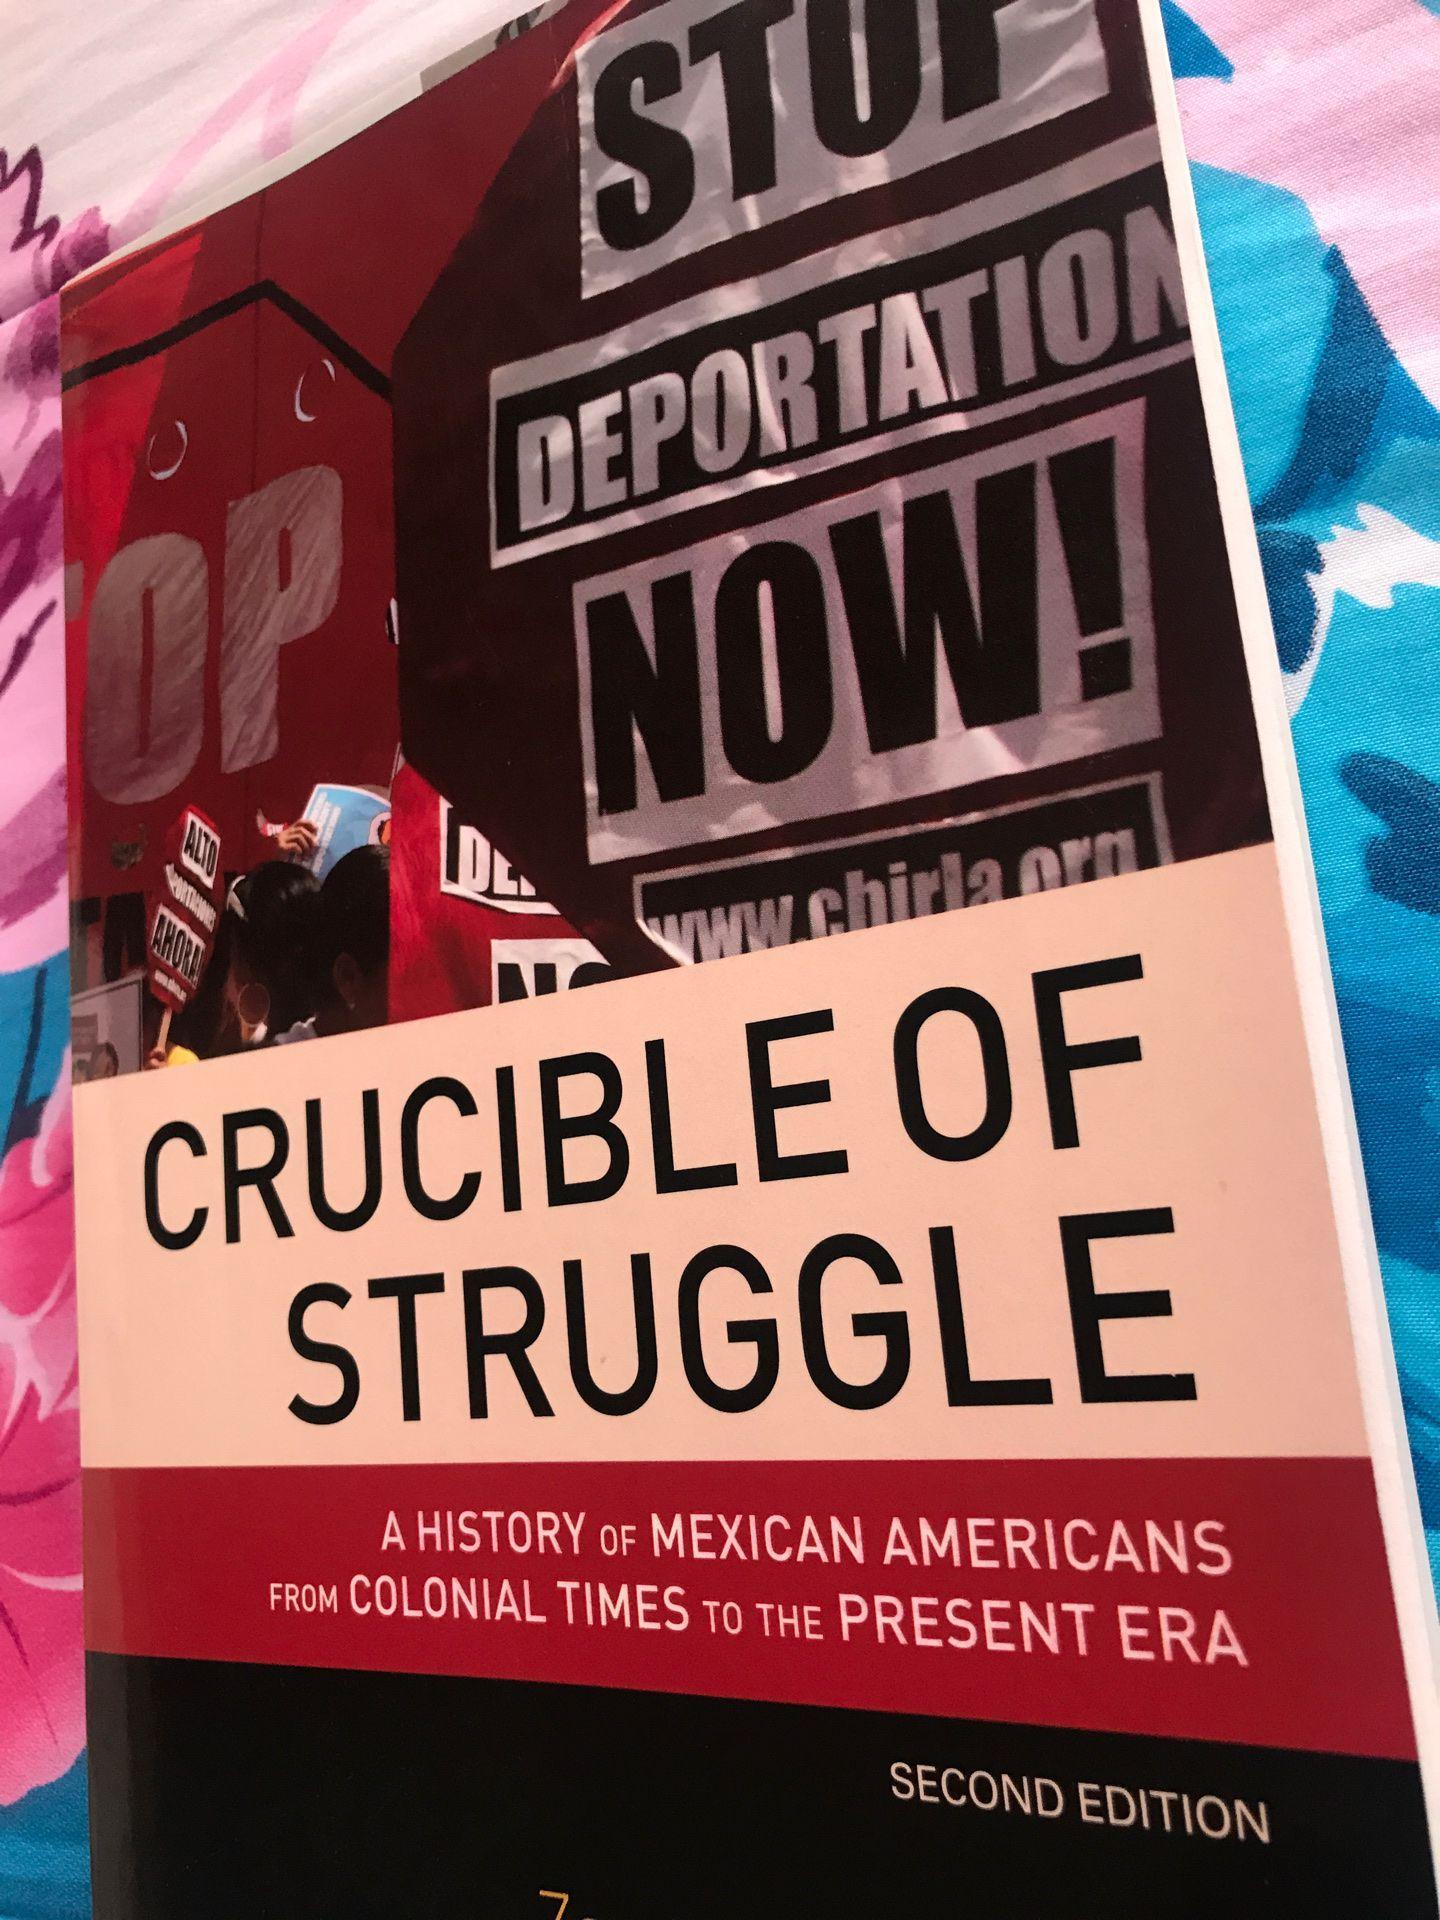 Crucible of Struggle by Zaragosa Vargas 2nd Edition